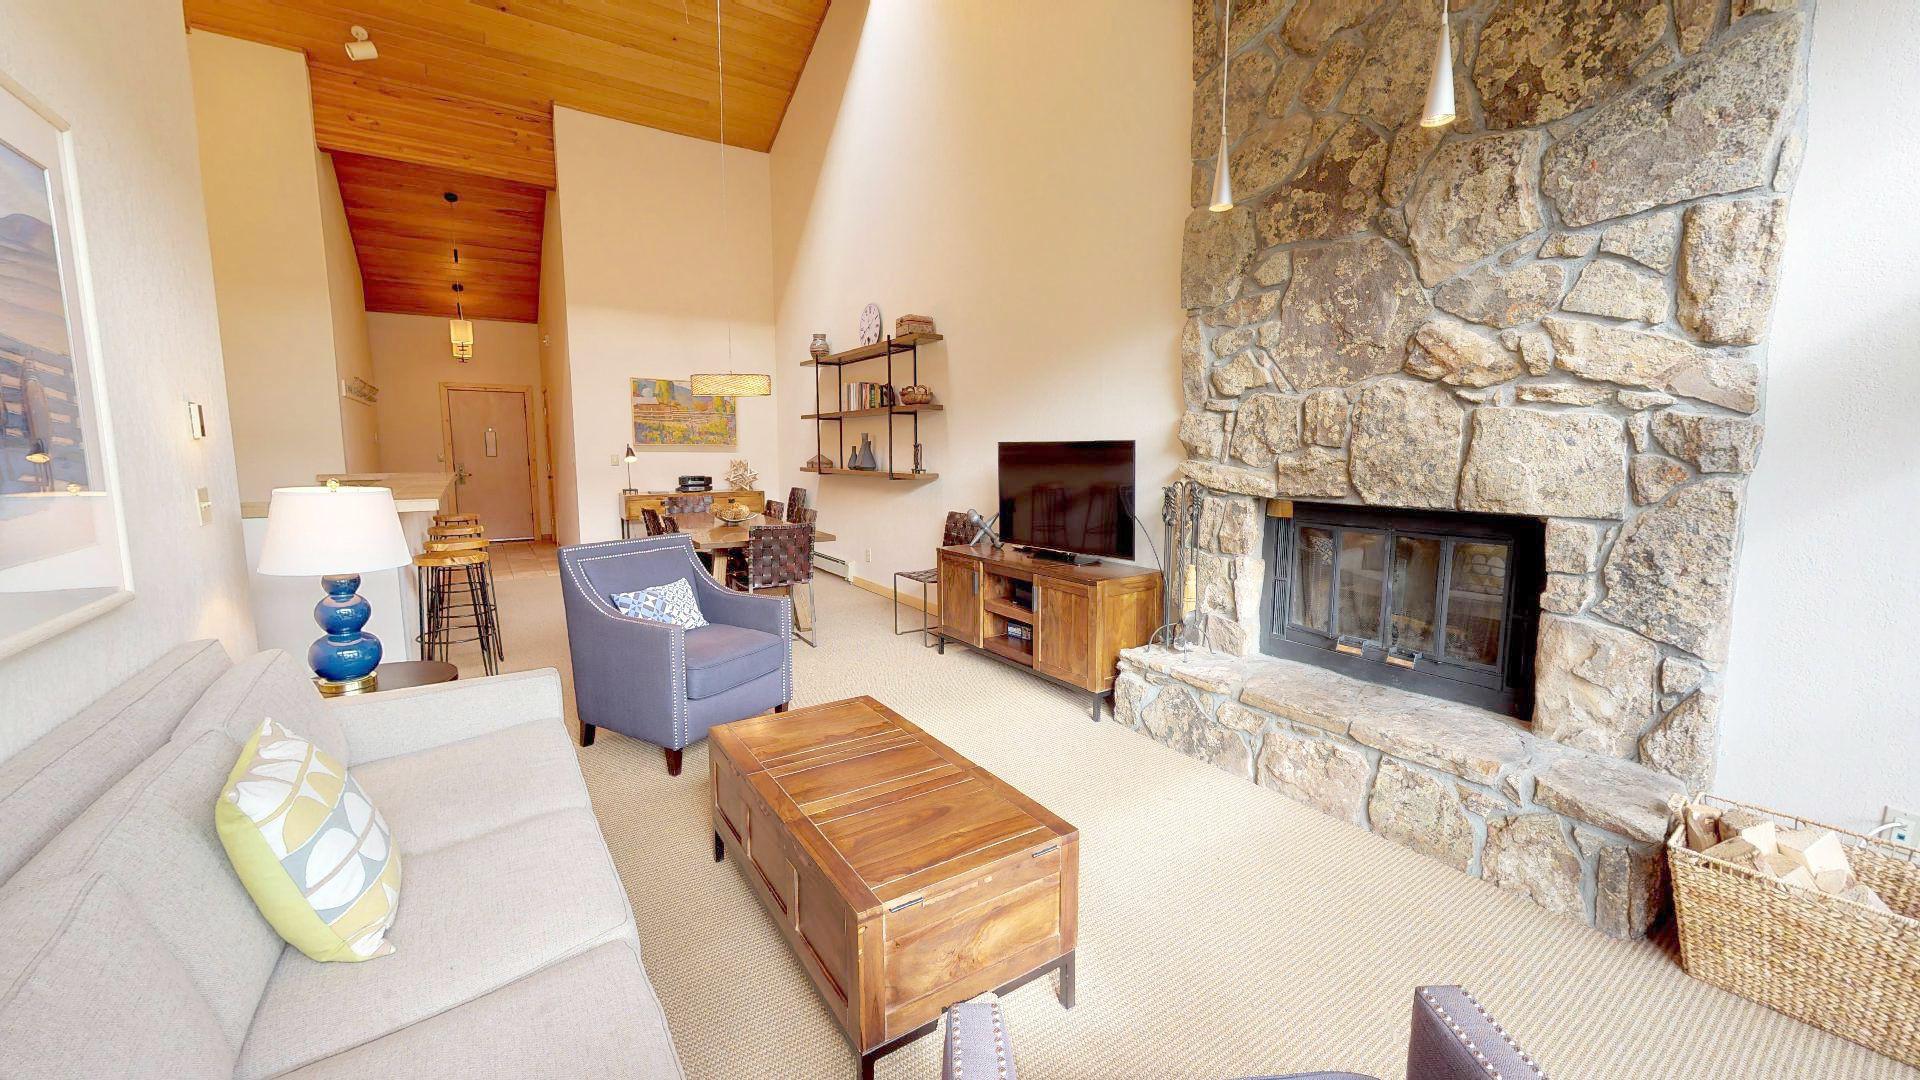 Courtesy of Snowmass Mountain Club Villa / Expedia.com